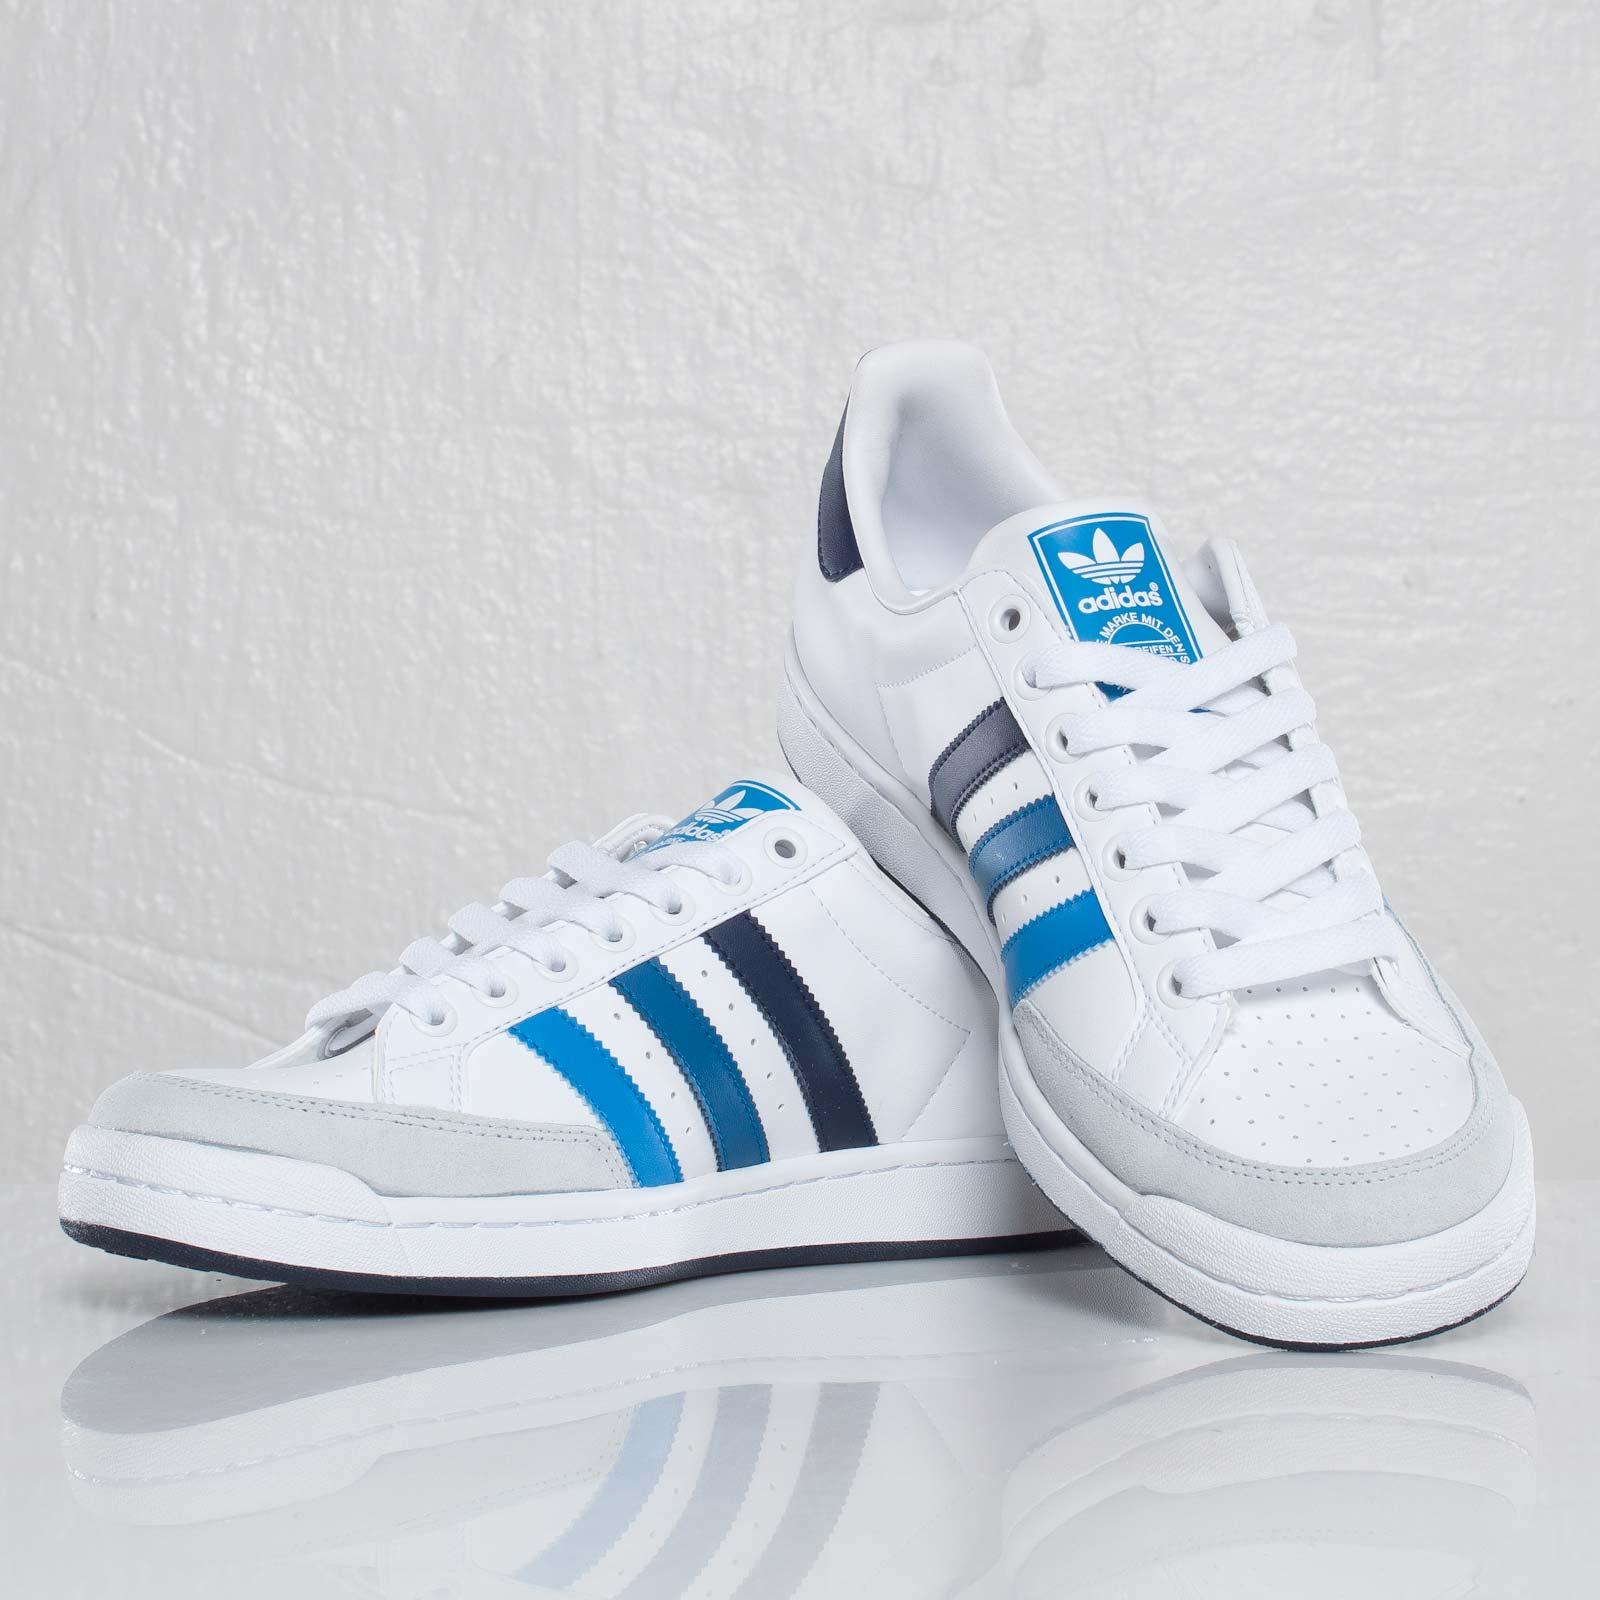 adidas Tennis Pro 110703 Basketsnstuff Baskets streetwear